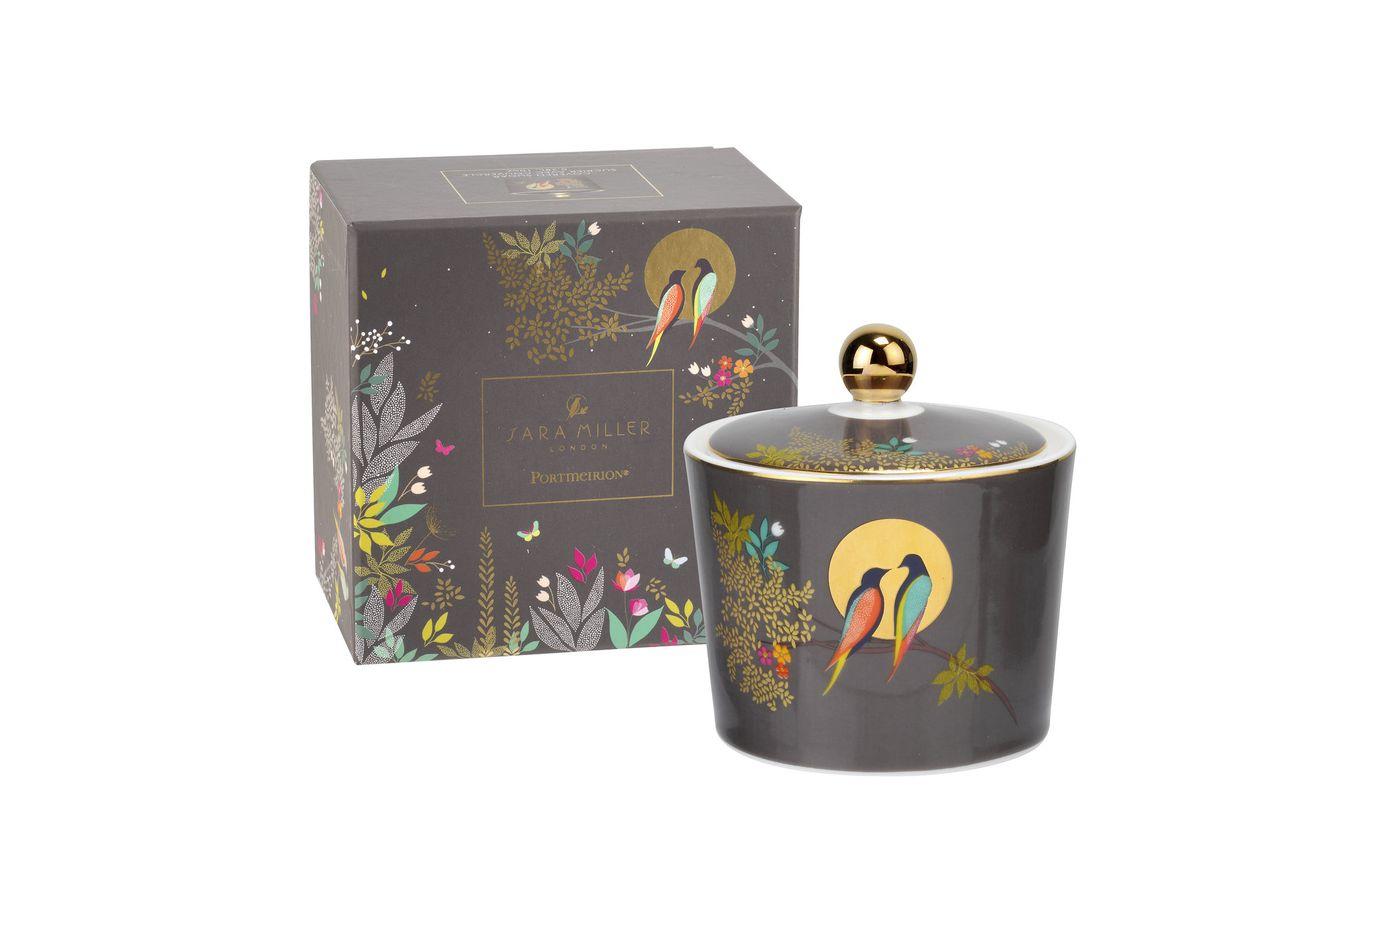 Sara Miller London for Portmeirion Chelsea Collection Sugar Bowl - Lidded (Tea) thumb 2